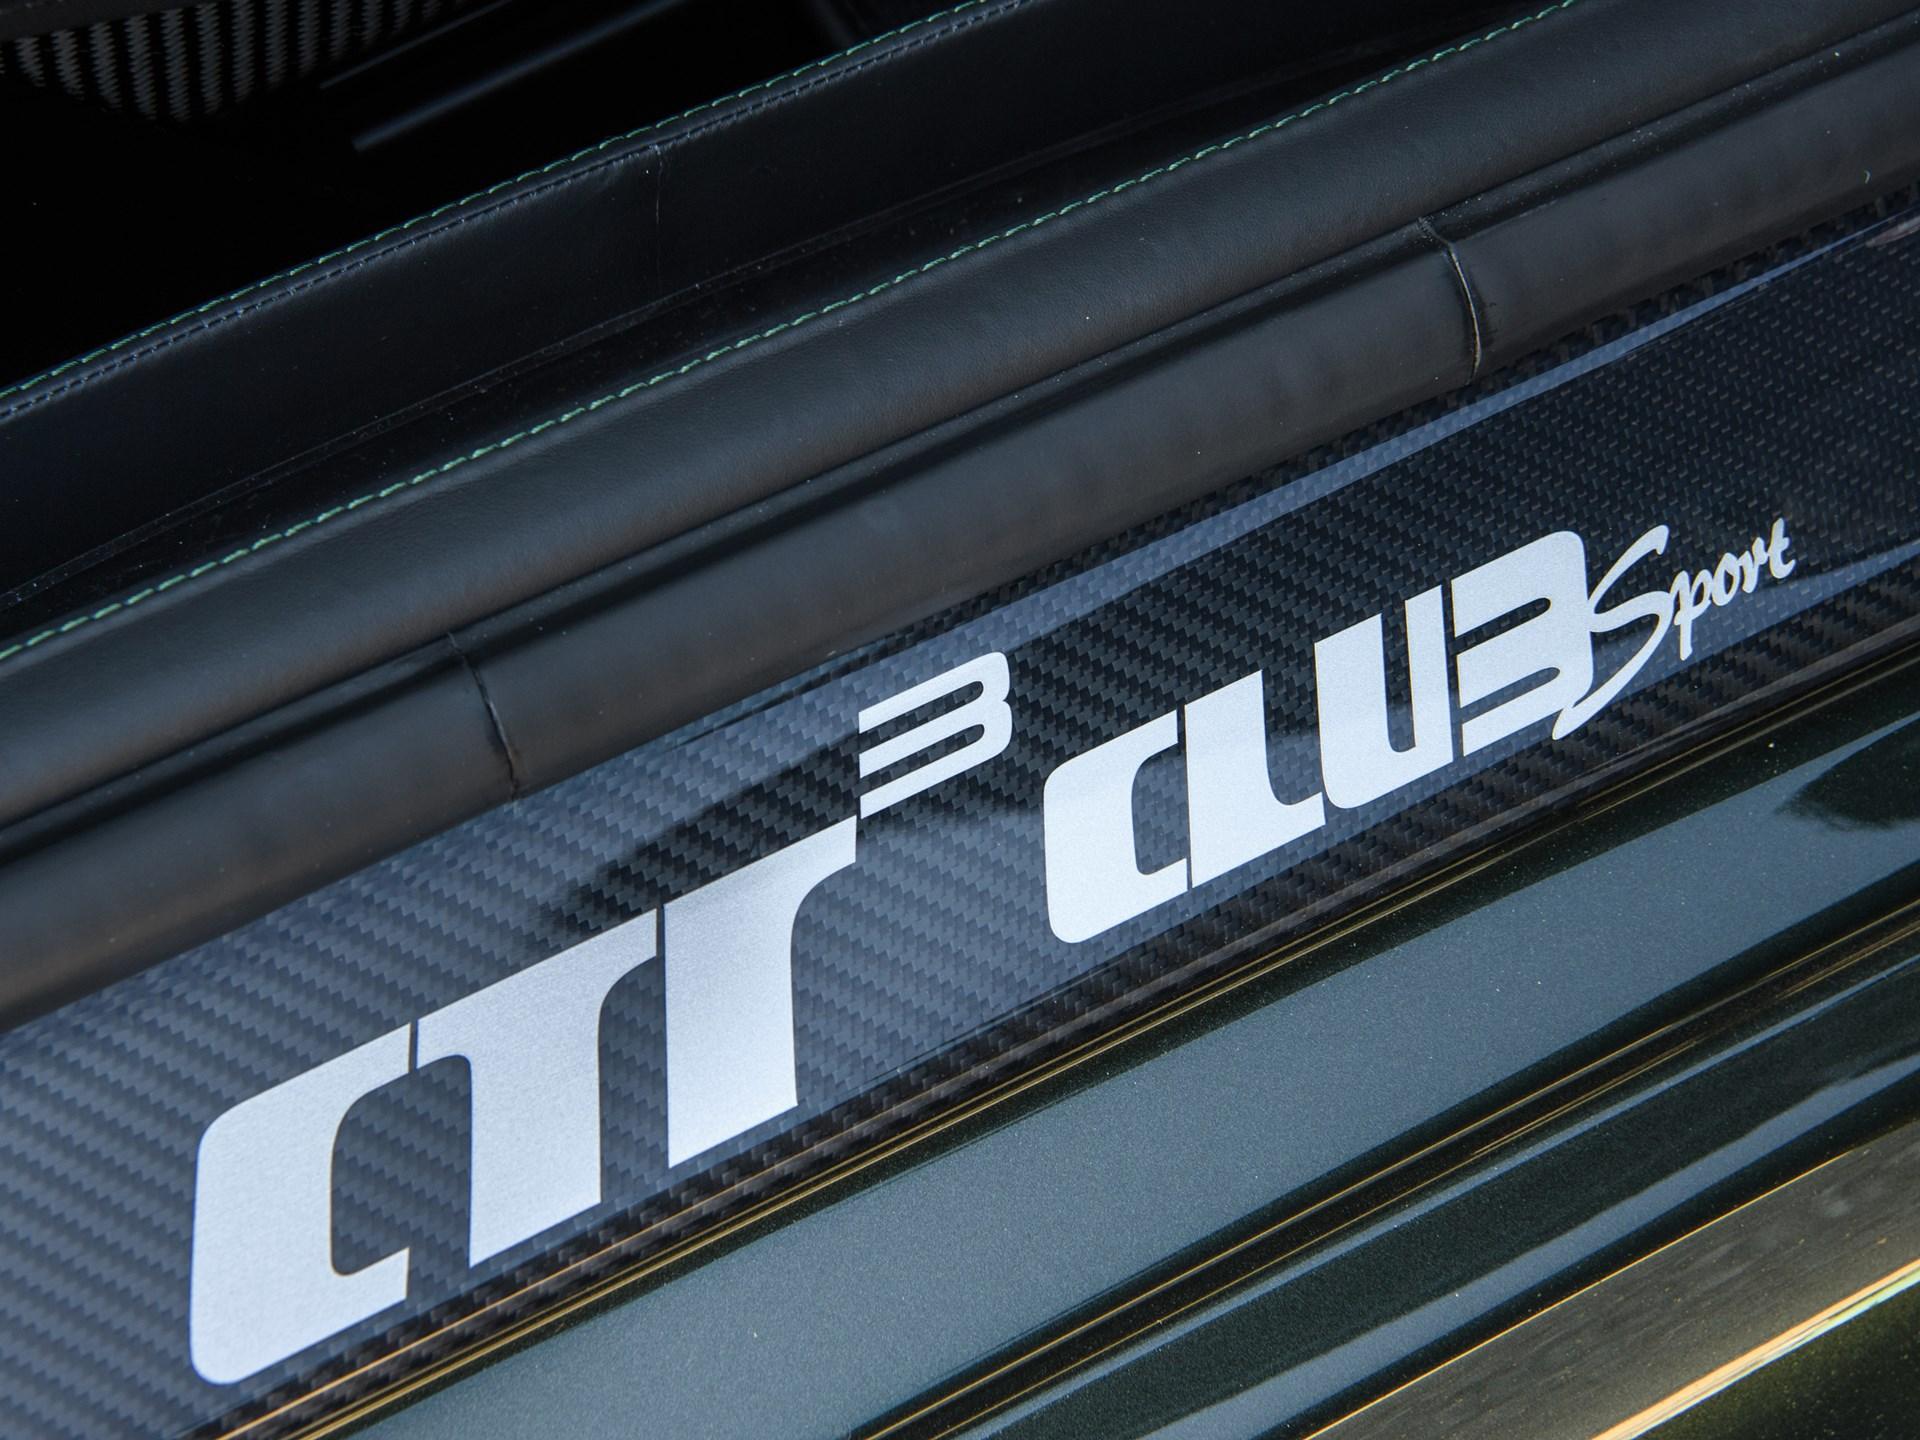 2018 RUF CTR3 Clubsport